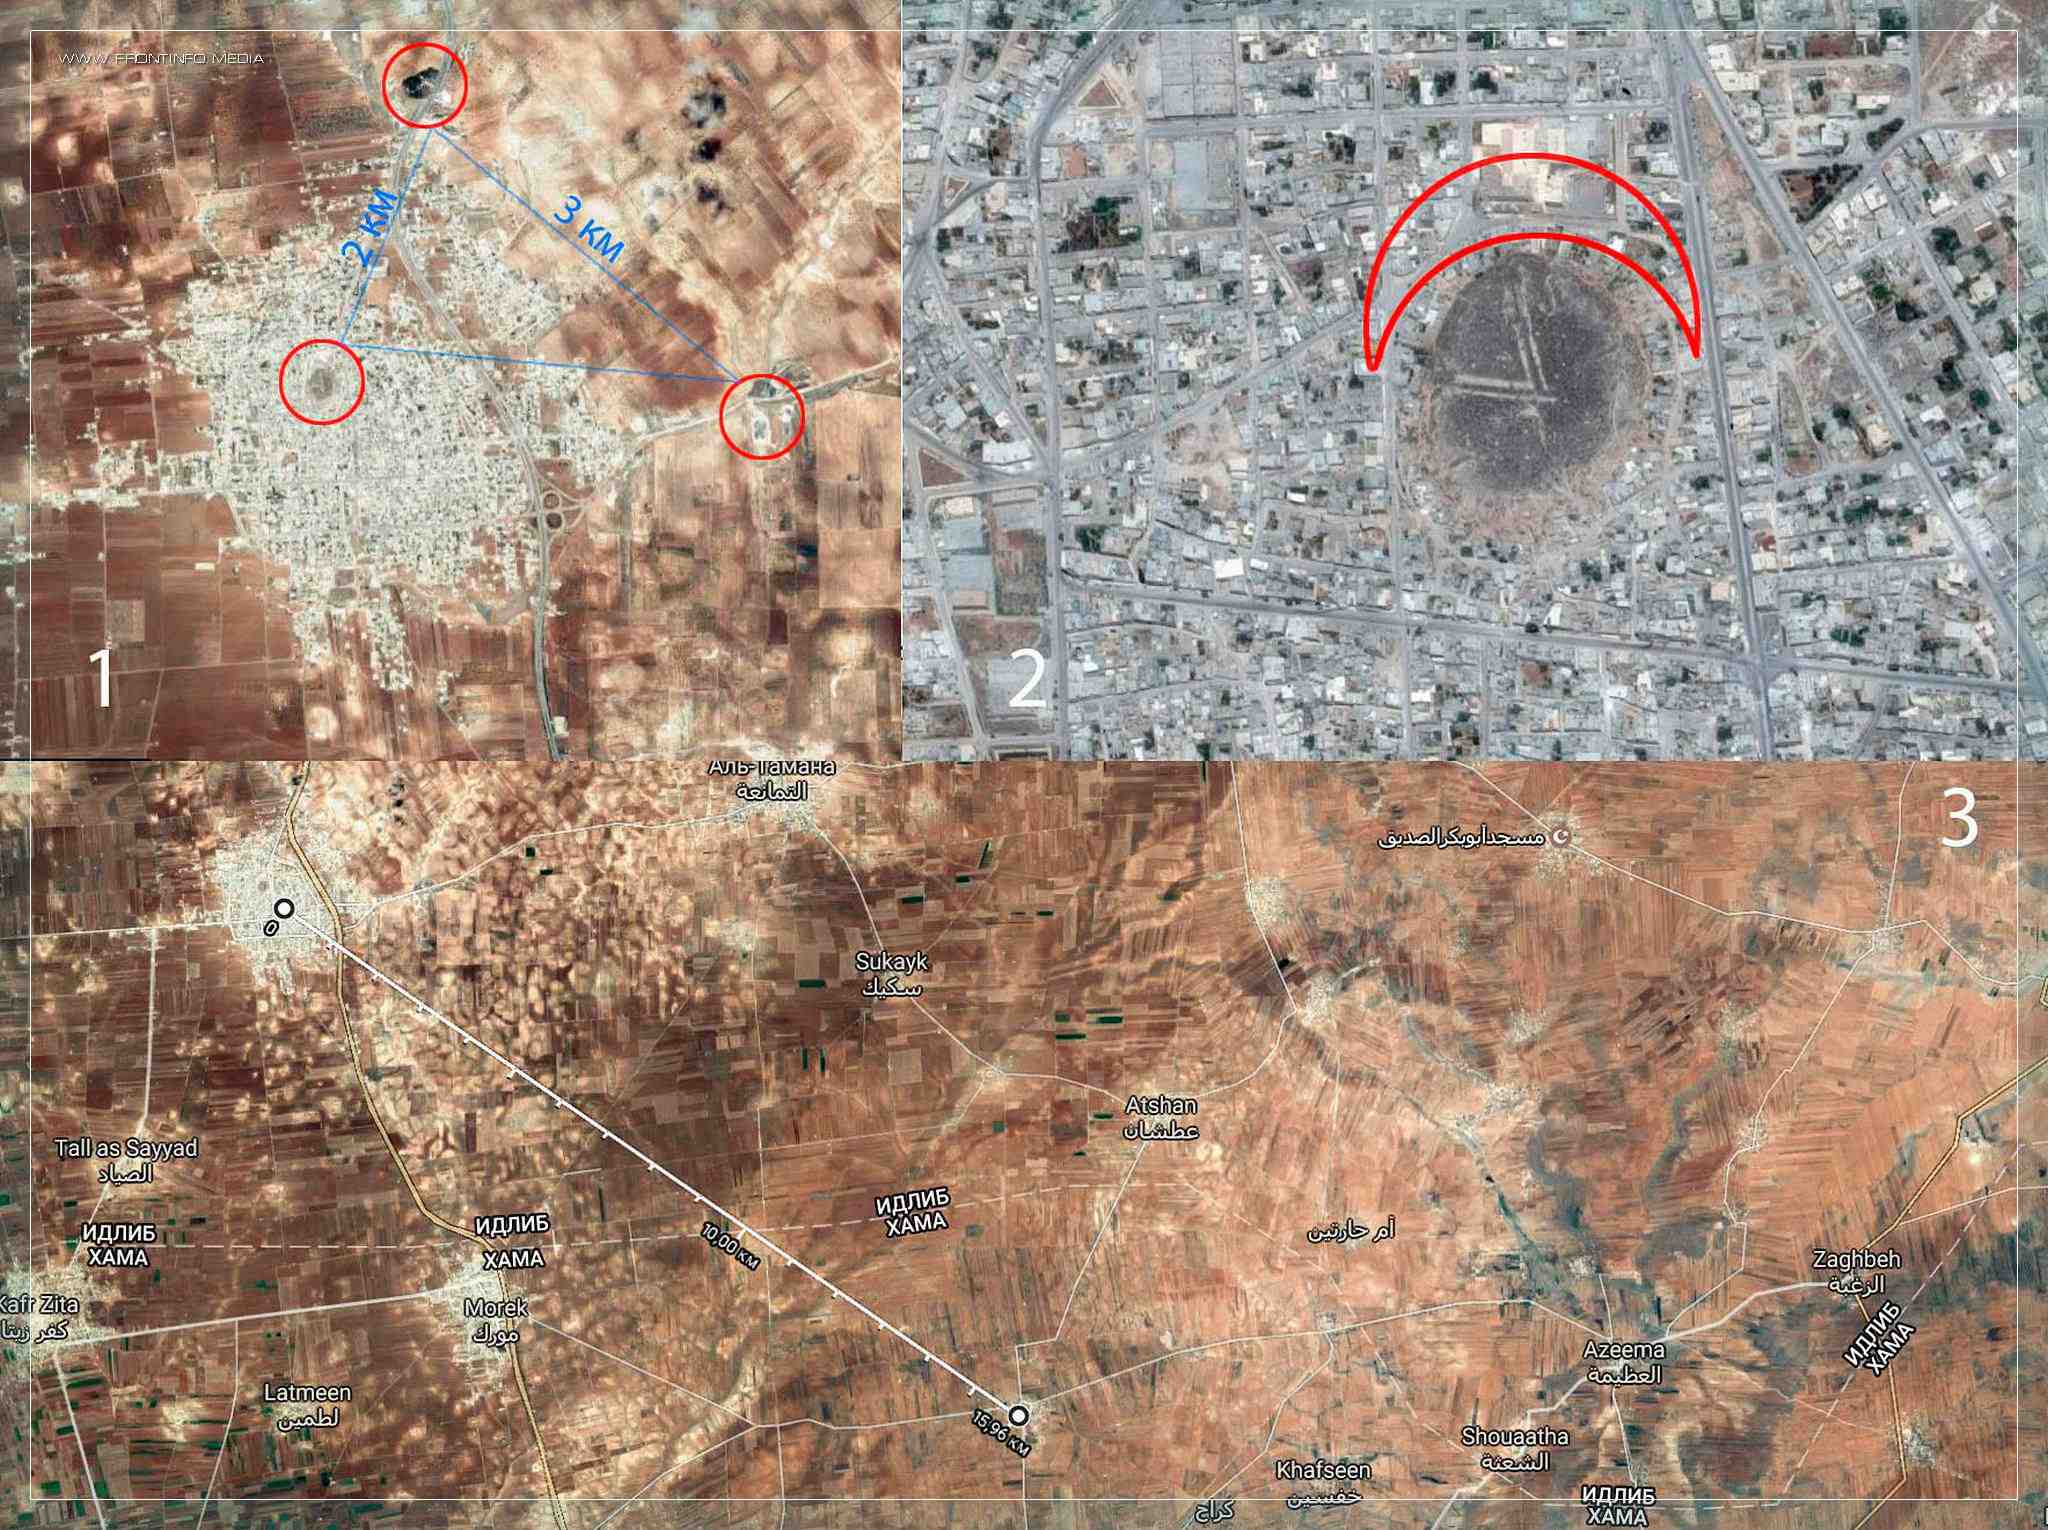 http://anna-news.info/wp-content/uploads/2017/04/syria.frontinfo.media_2017-04-06_14_34_00001.jpg